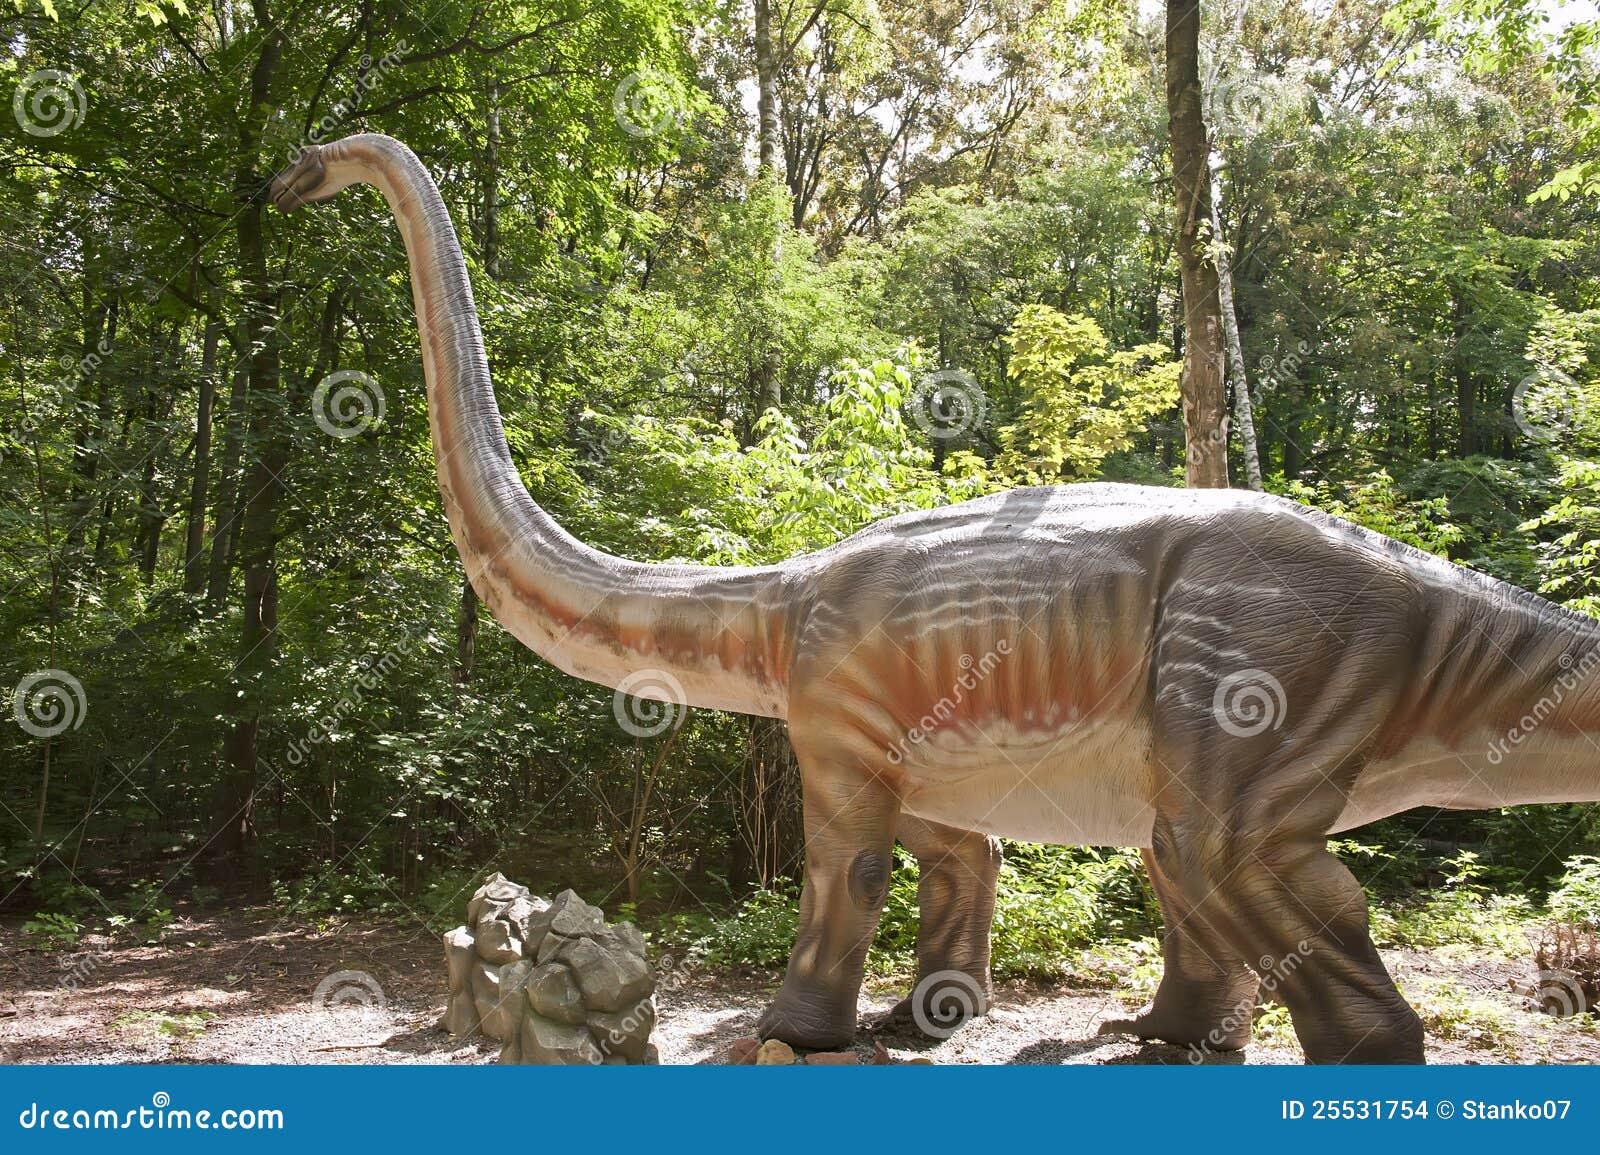 Huge dinosaur